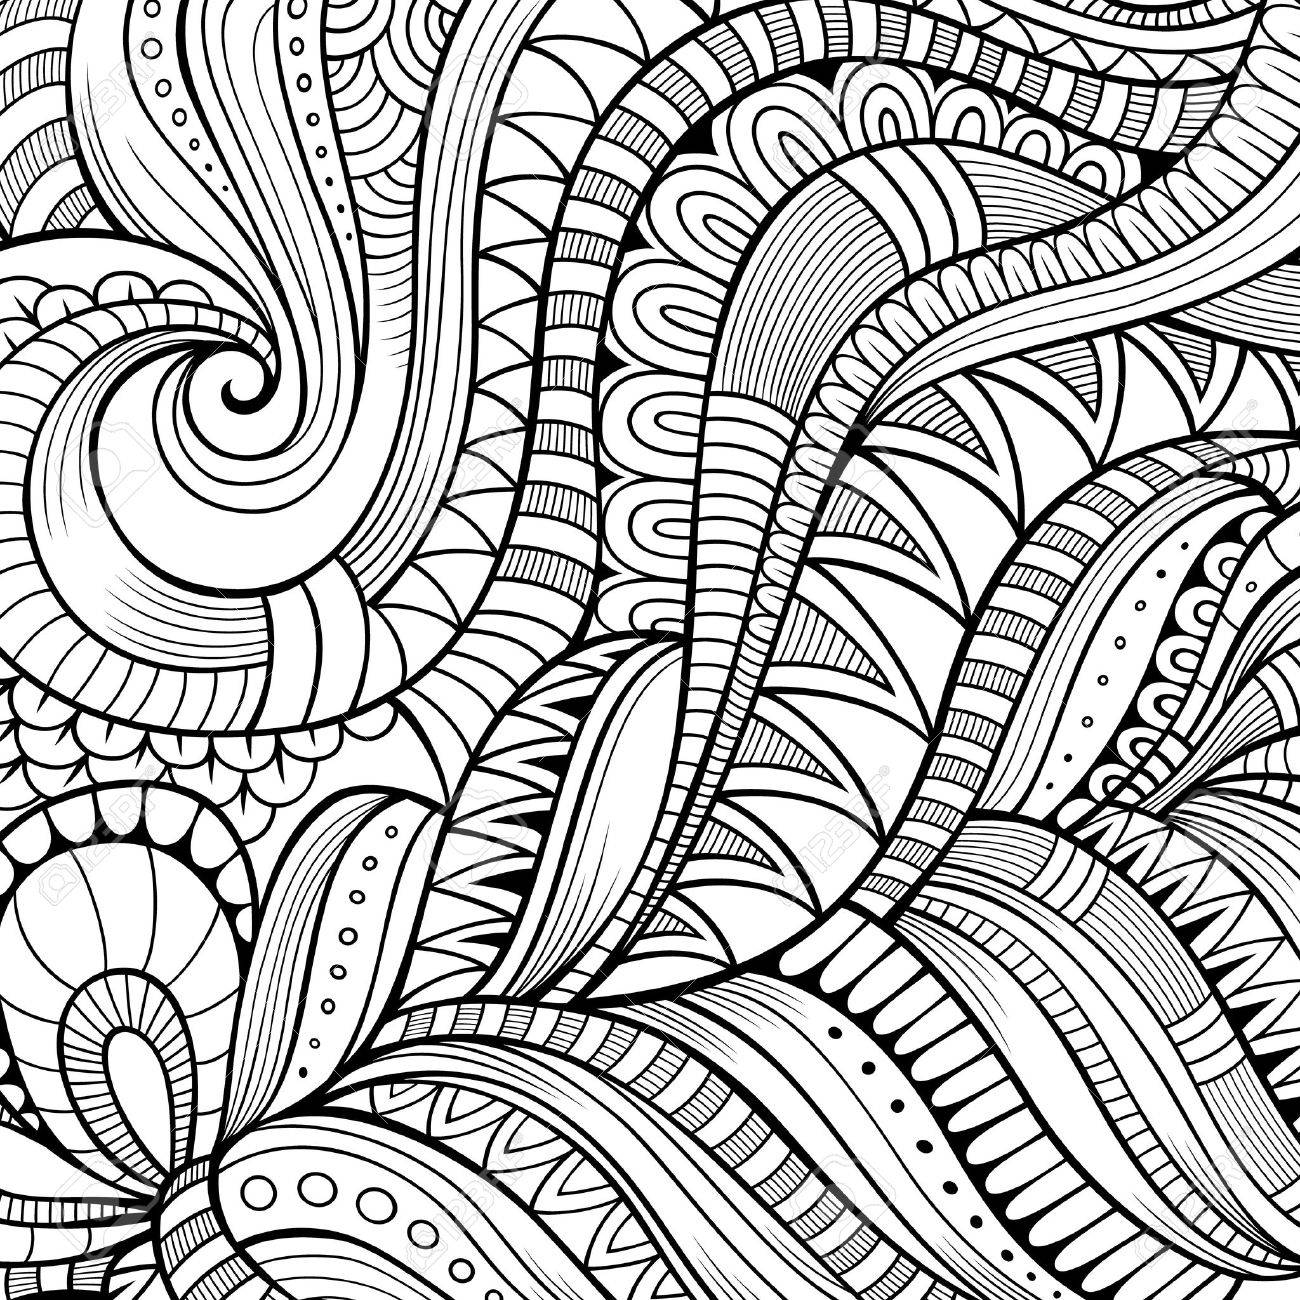 Decorative hand drawn nature ornamental ethnic vector background - 43976859